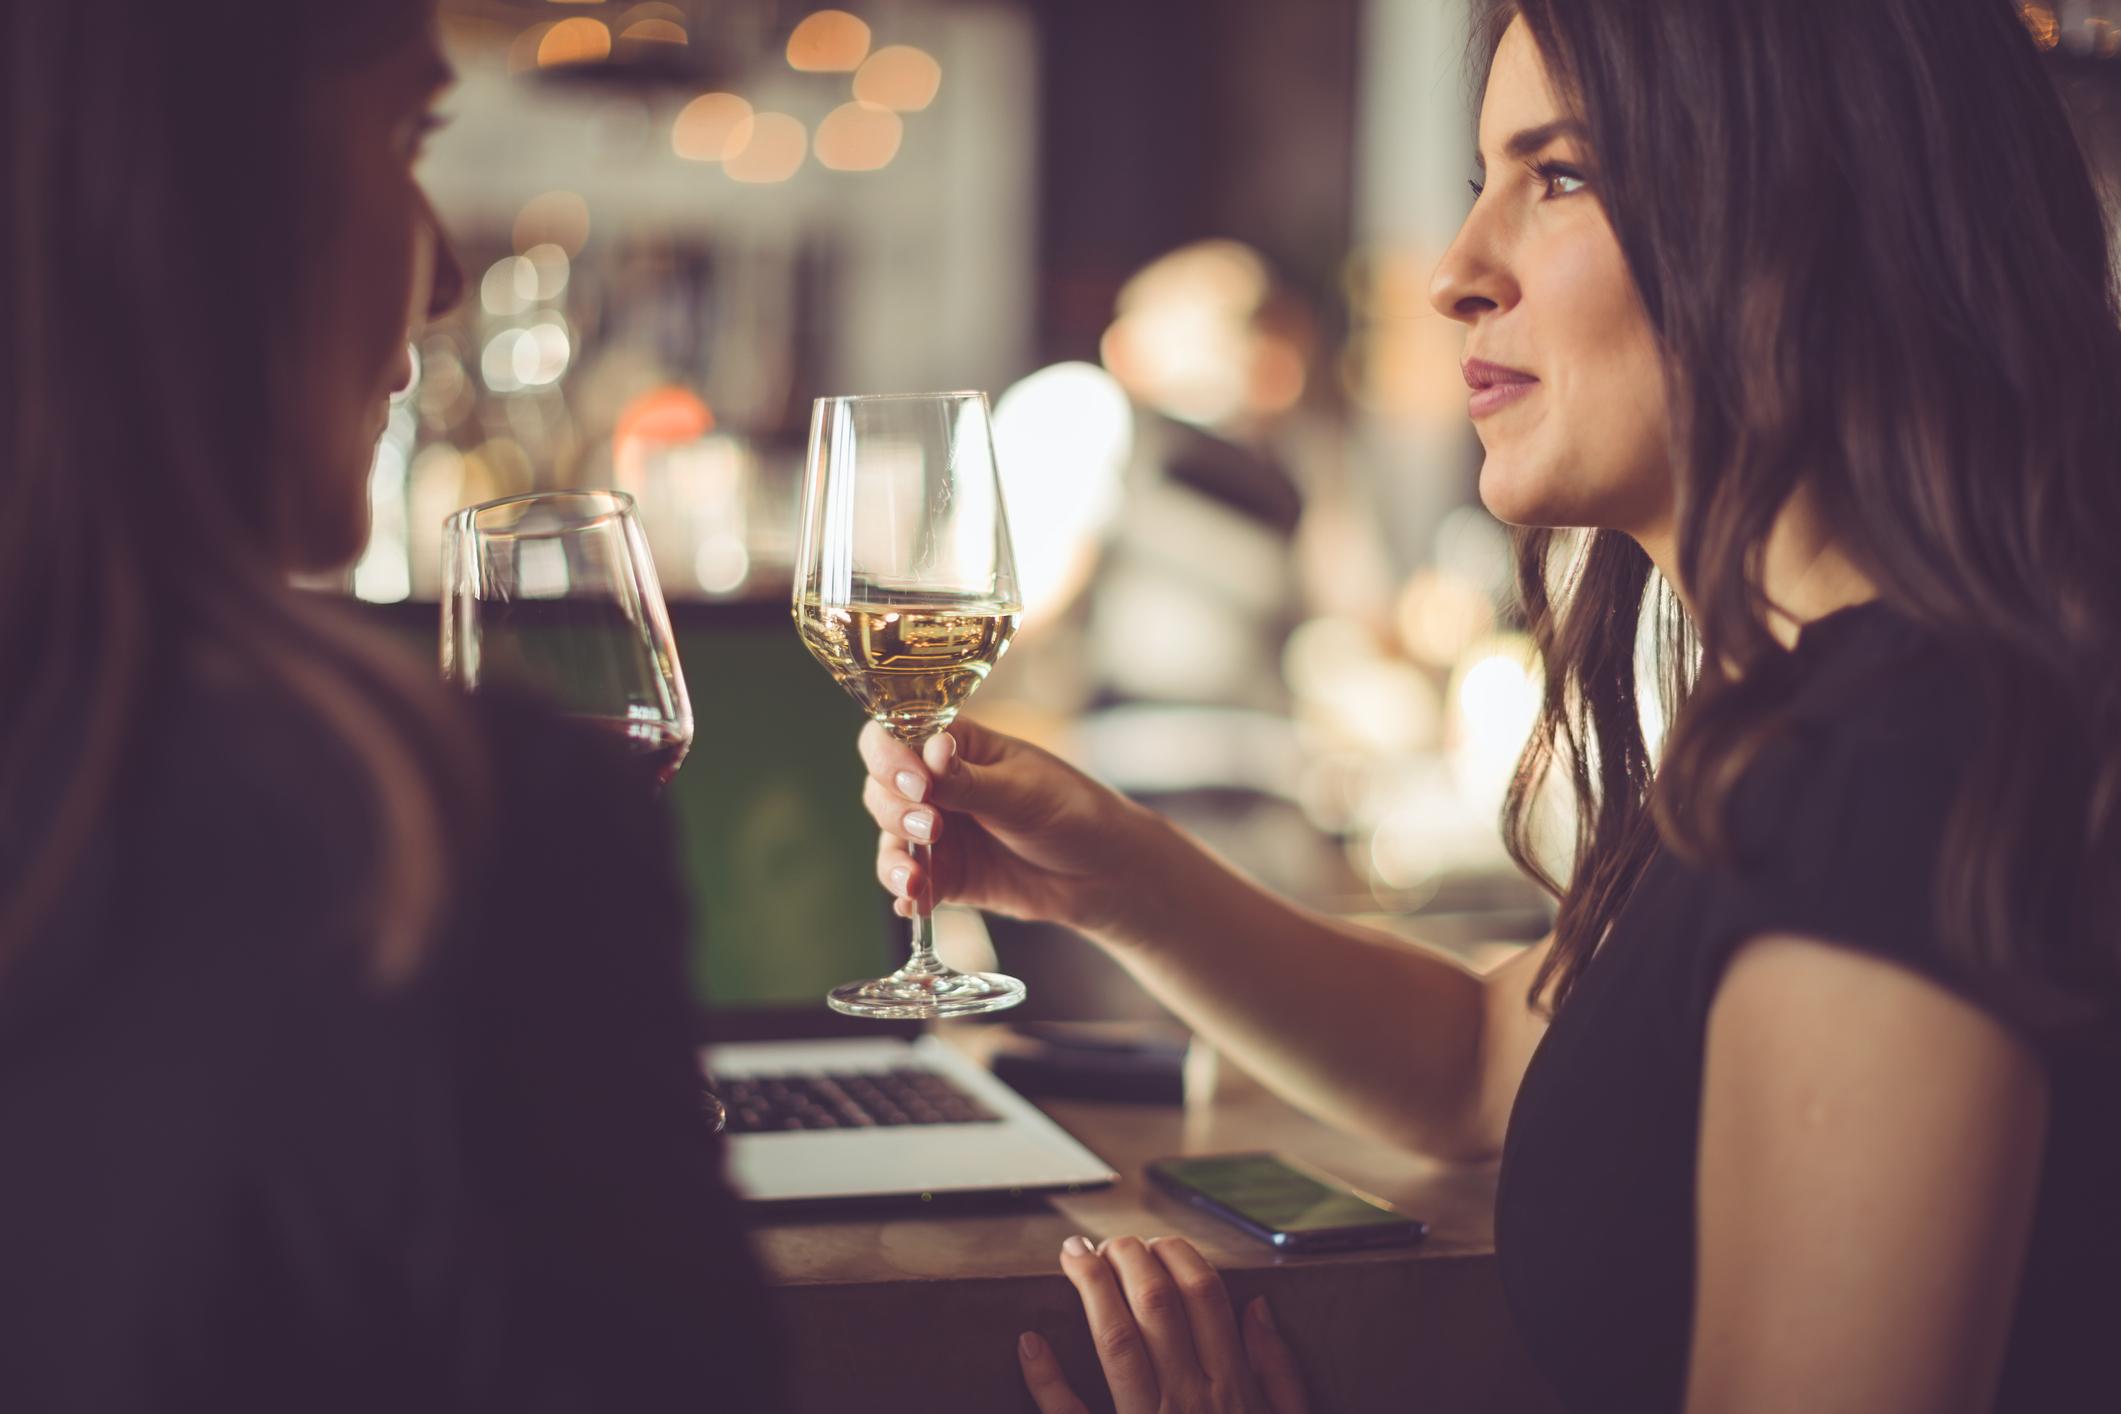 The perfect wine consumer